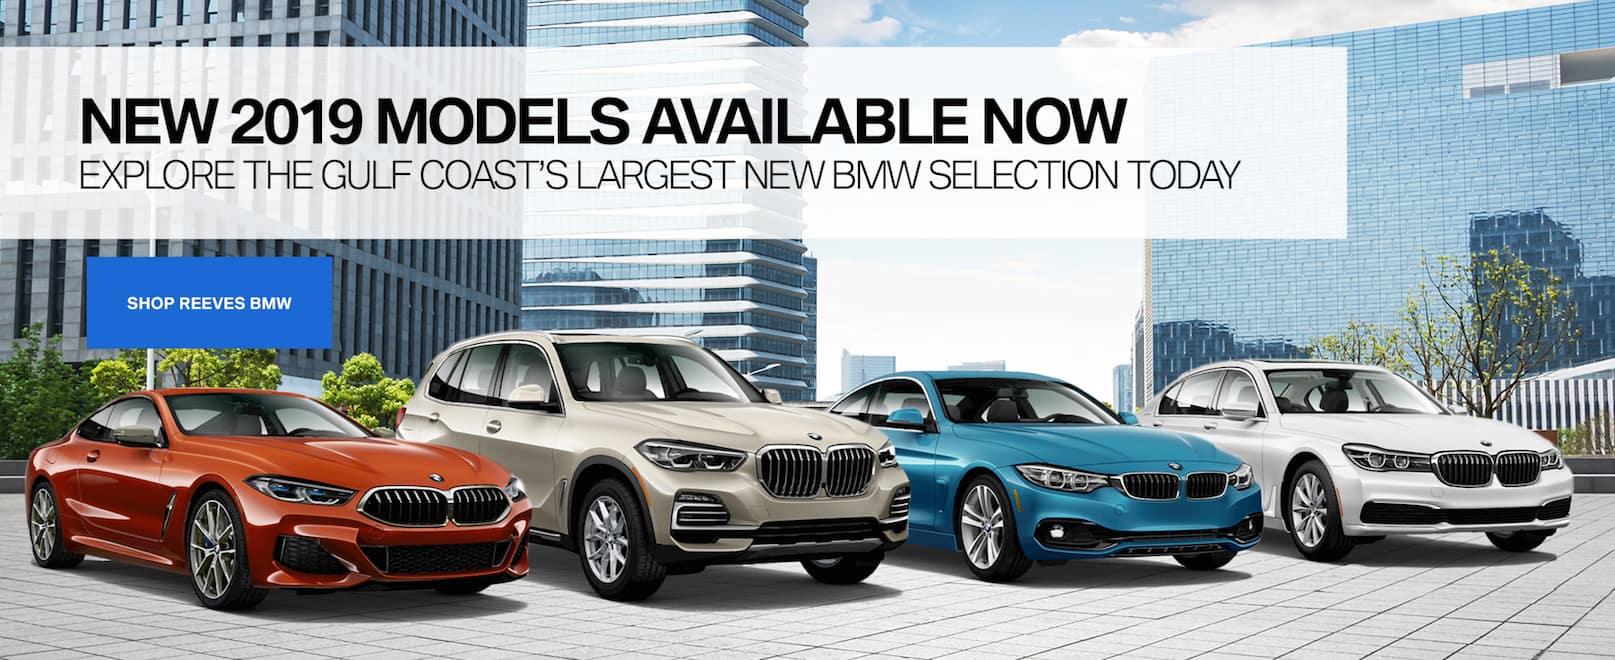 2019 BMW Models